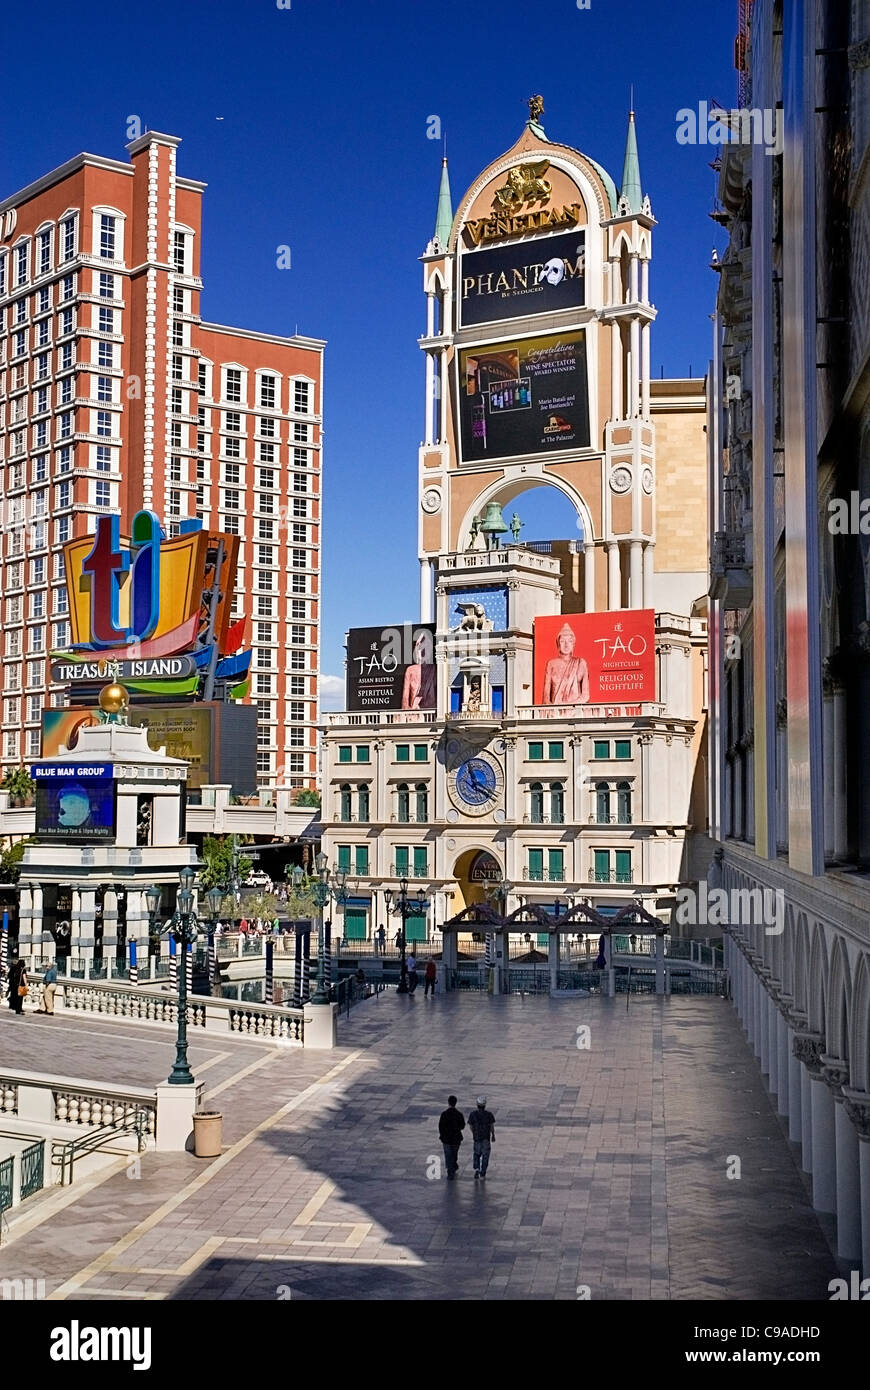 USA, Nevada, Las Vegas, The Strip, Eingang zum Venetian Hotel und Casino. Stockbild